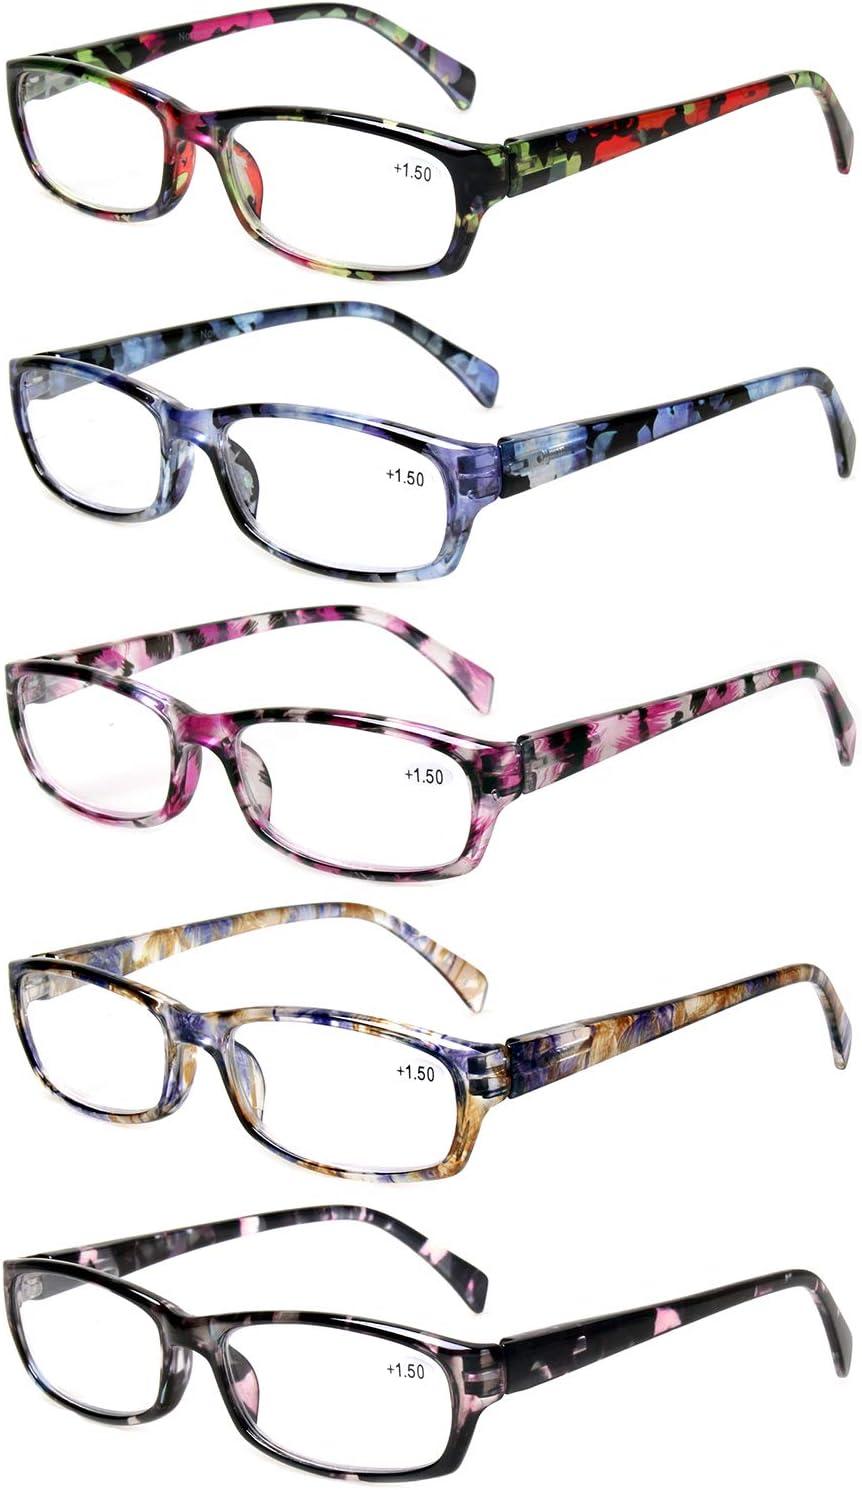 20 Pack Reading Glasses Women Spring Hinge Pattern Design Glasses for  Reading +20.20, 20 Pack Mix Color